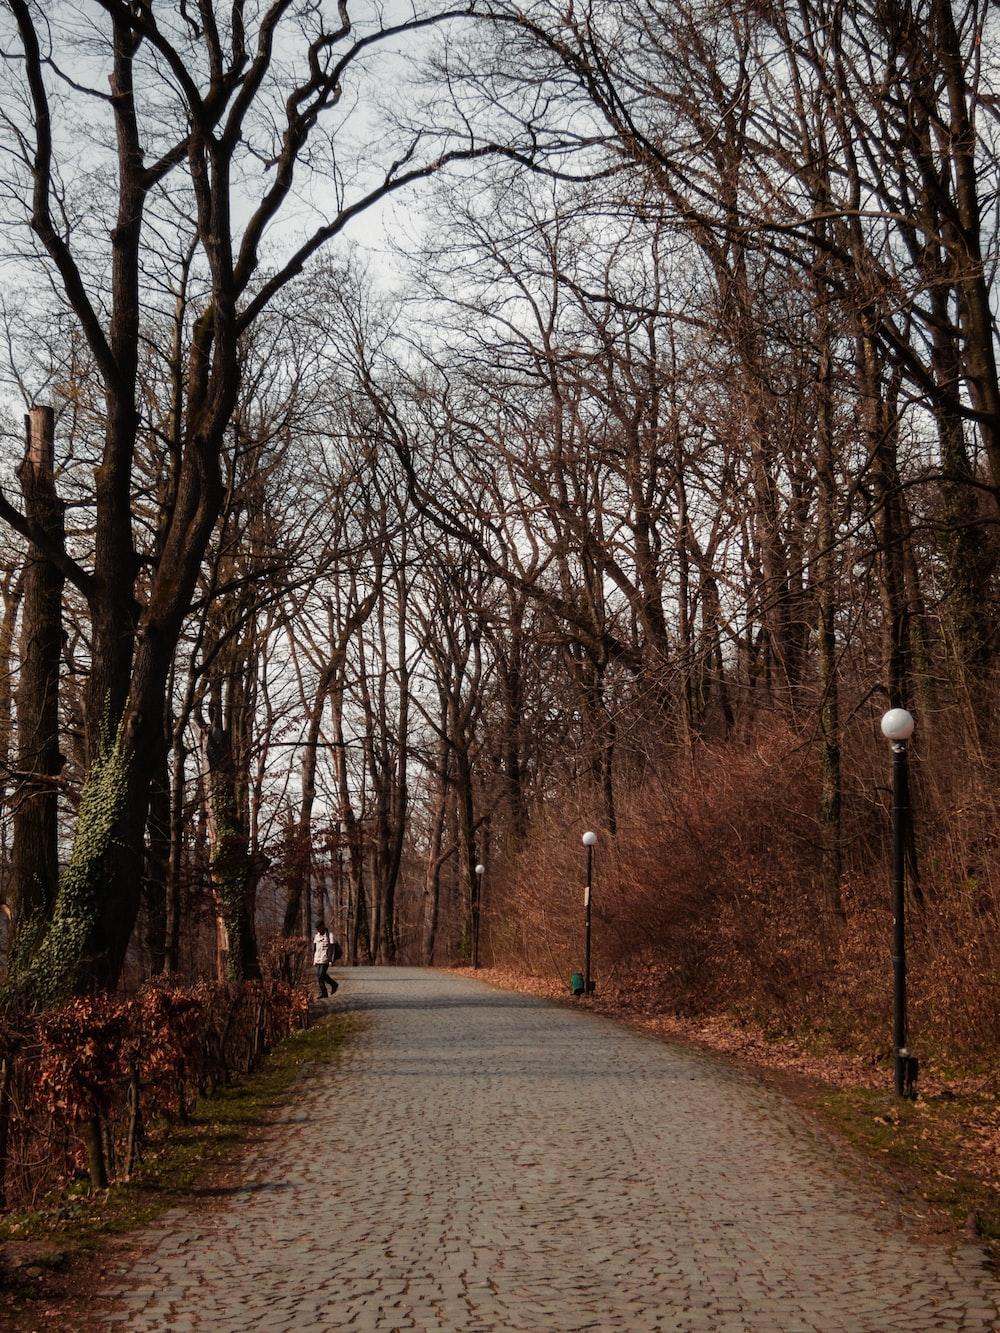 pathway under bare trees